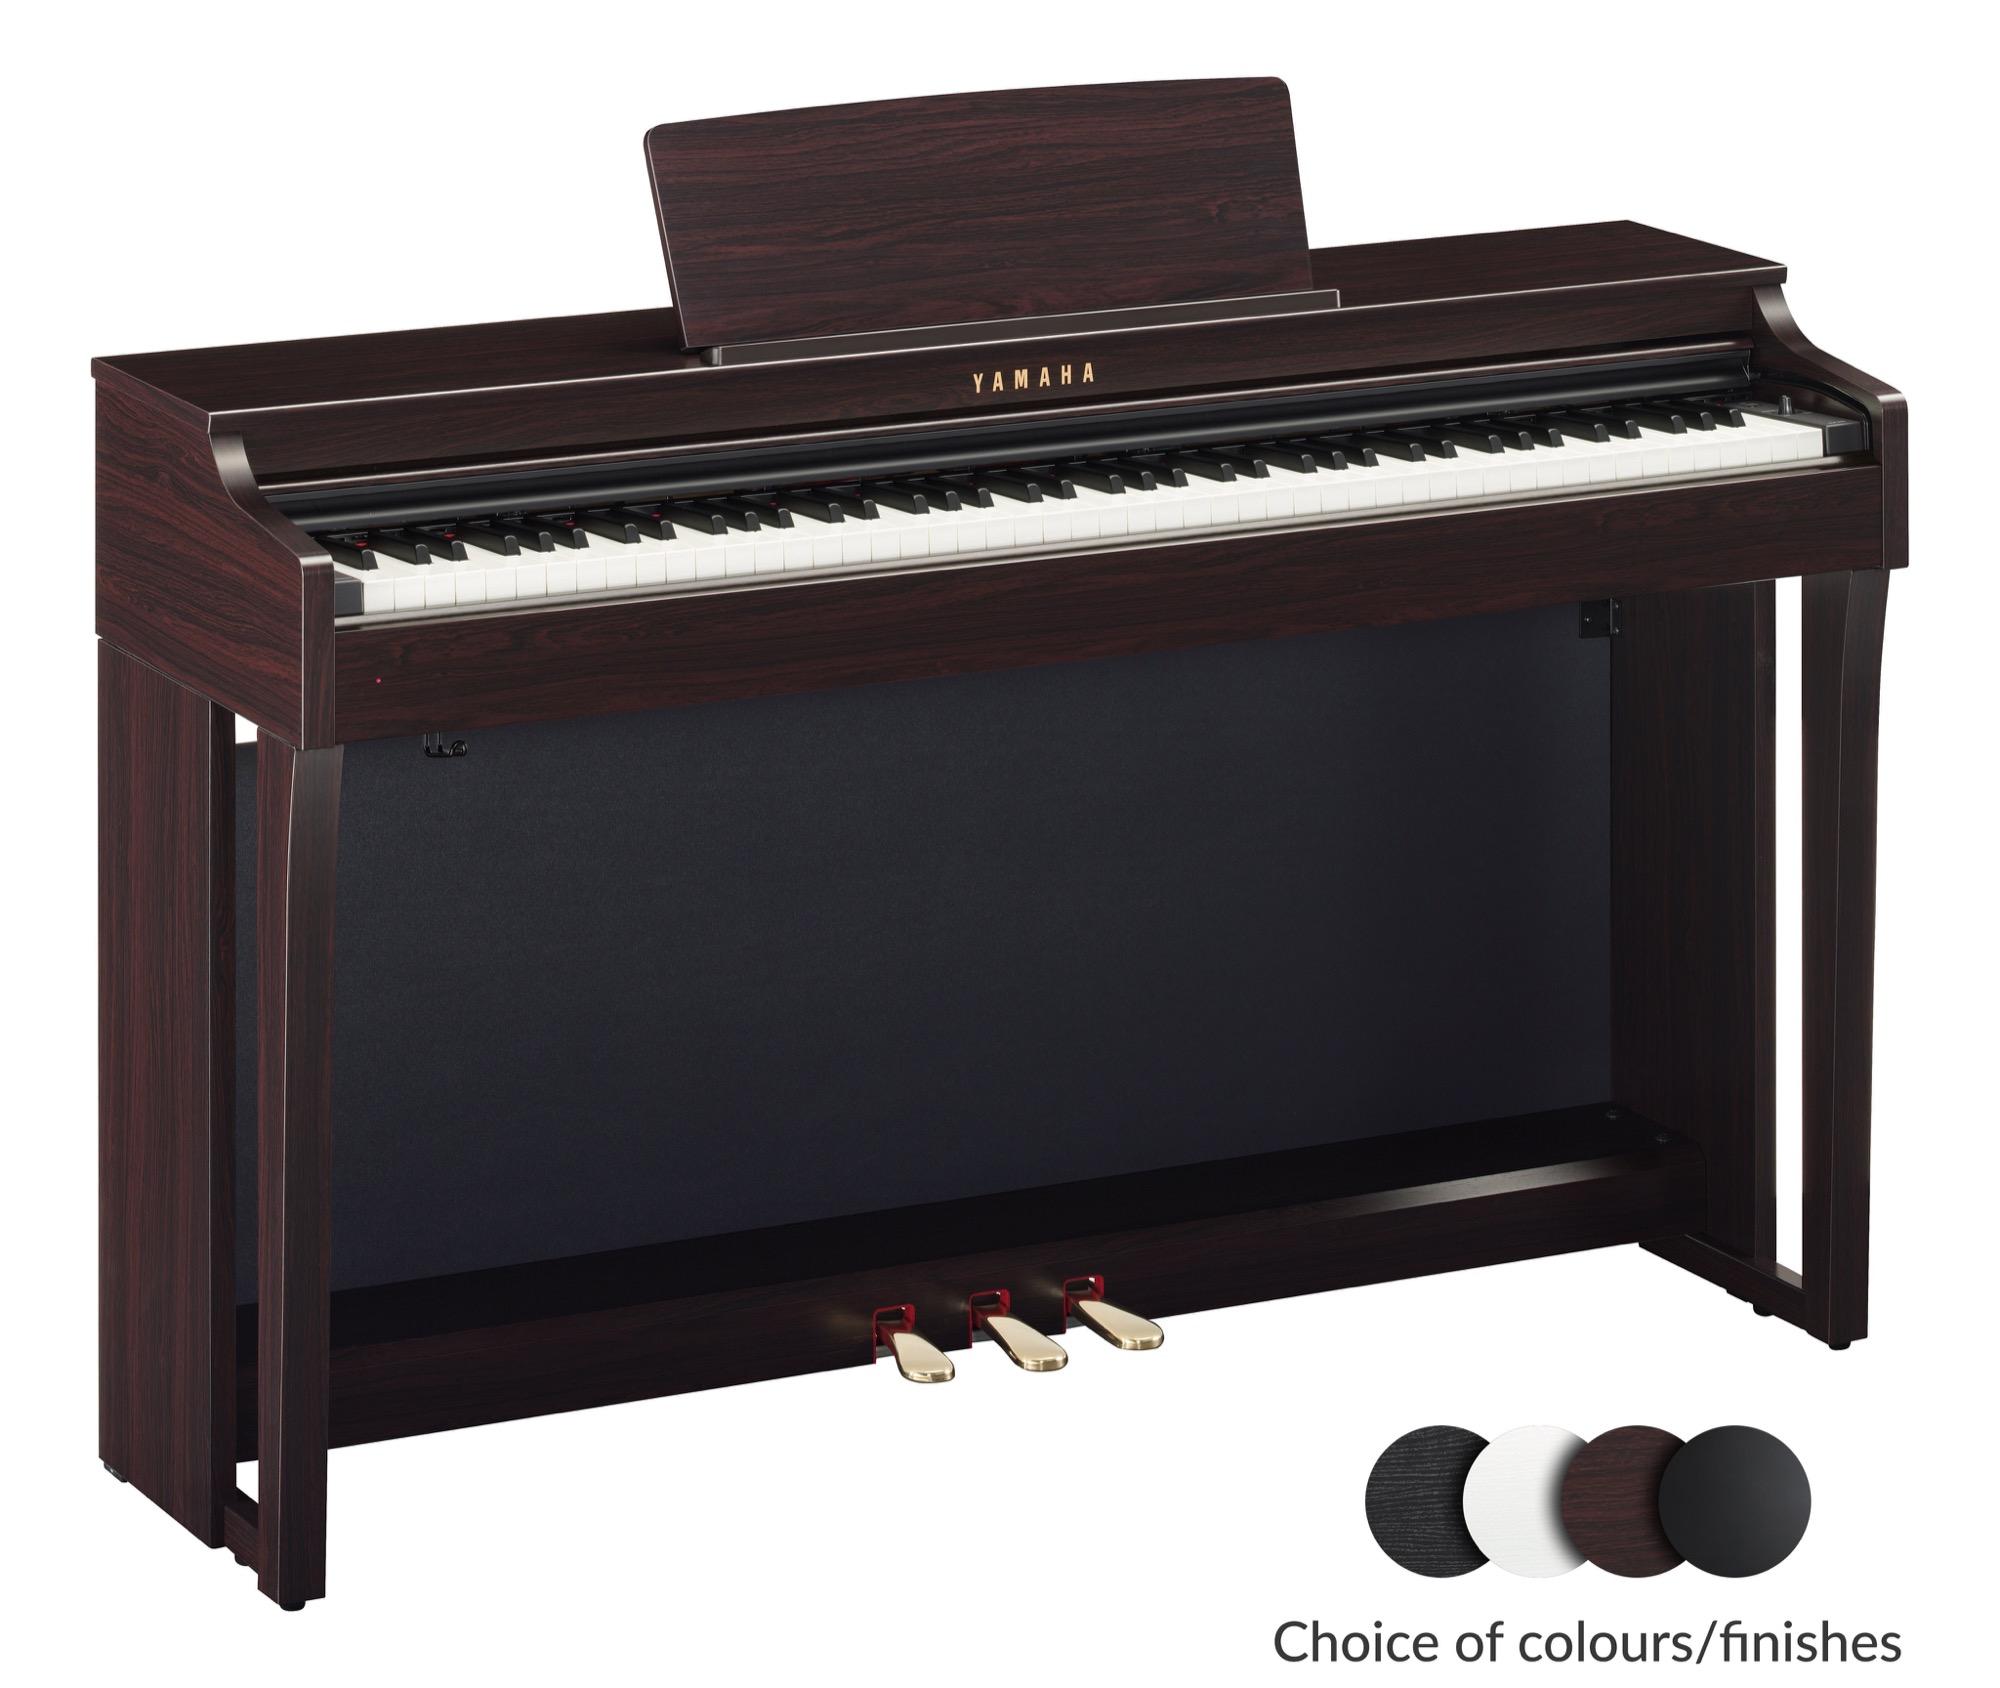 yamaha clp 625. clp-625 clavinova digital piano yamaha clp 625 b